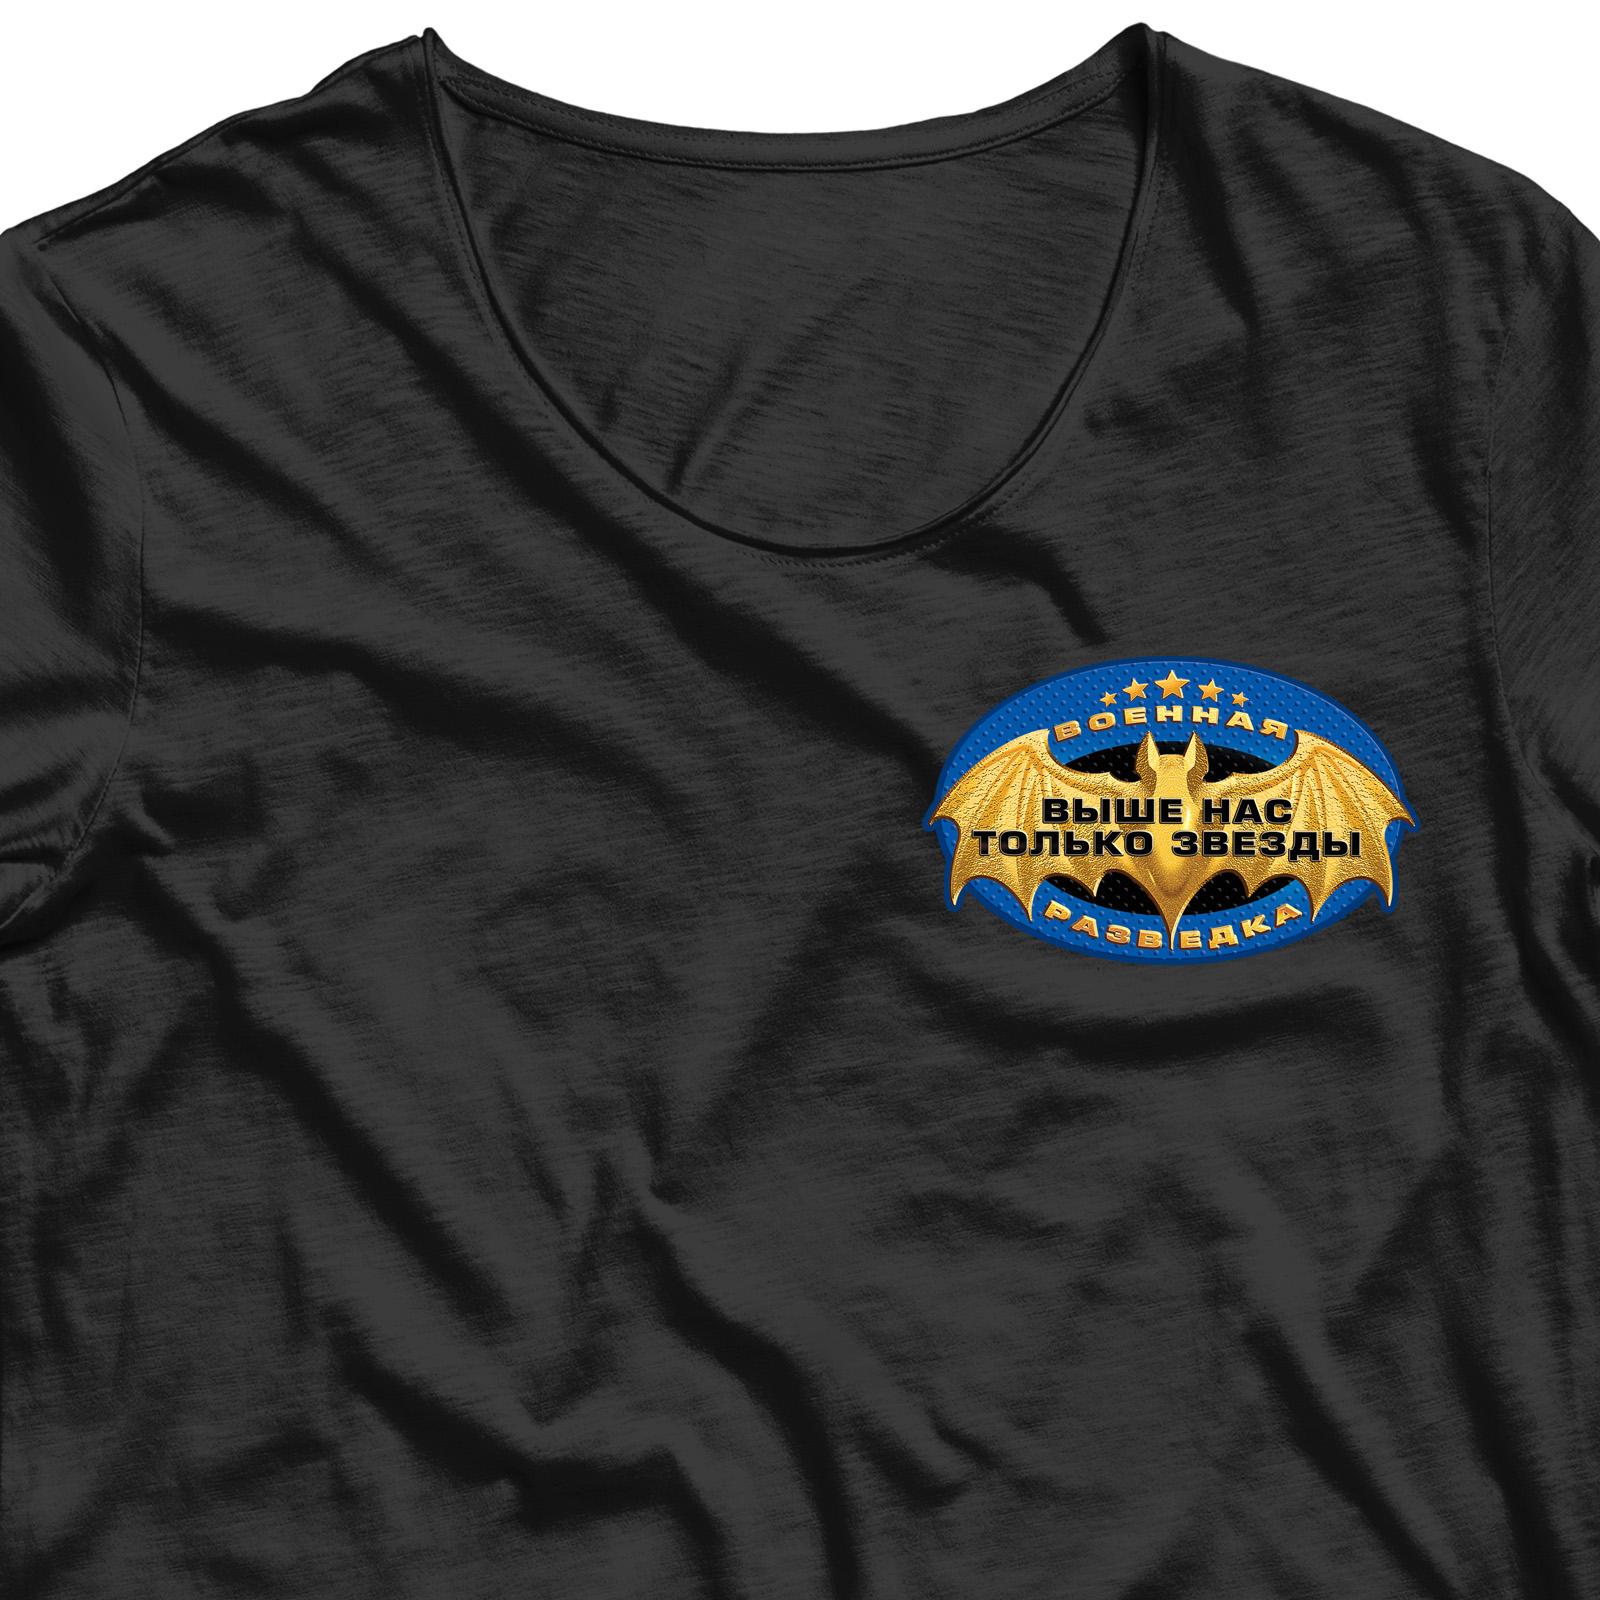 Сублимация на футболку Военная разведка.